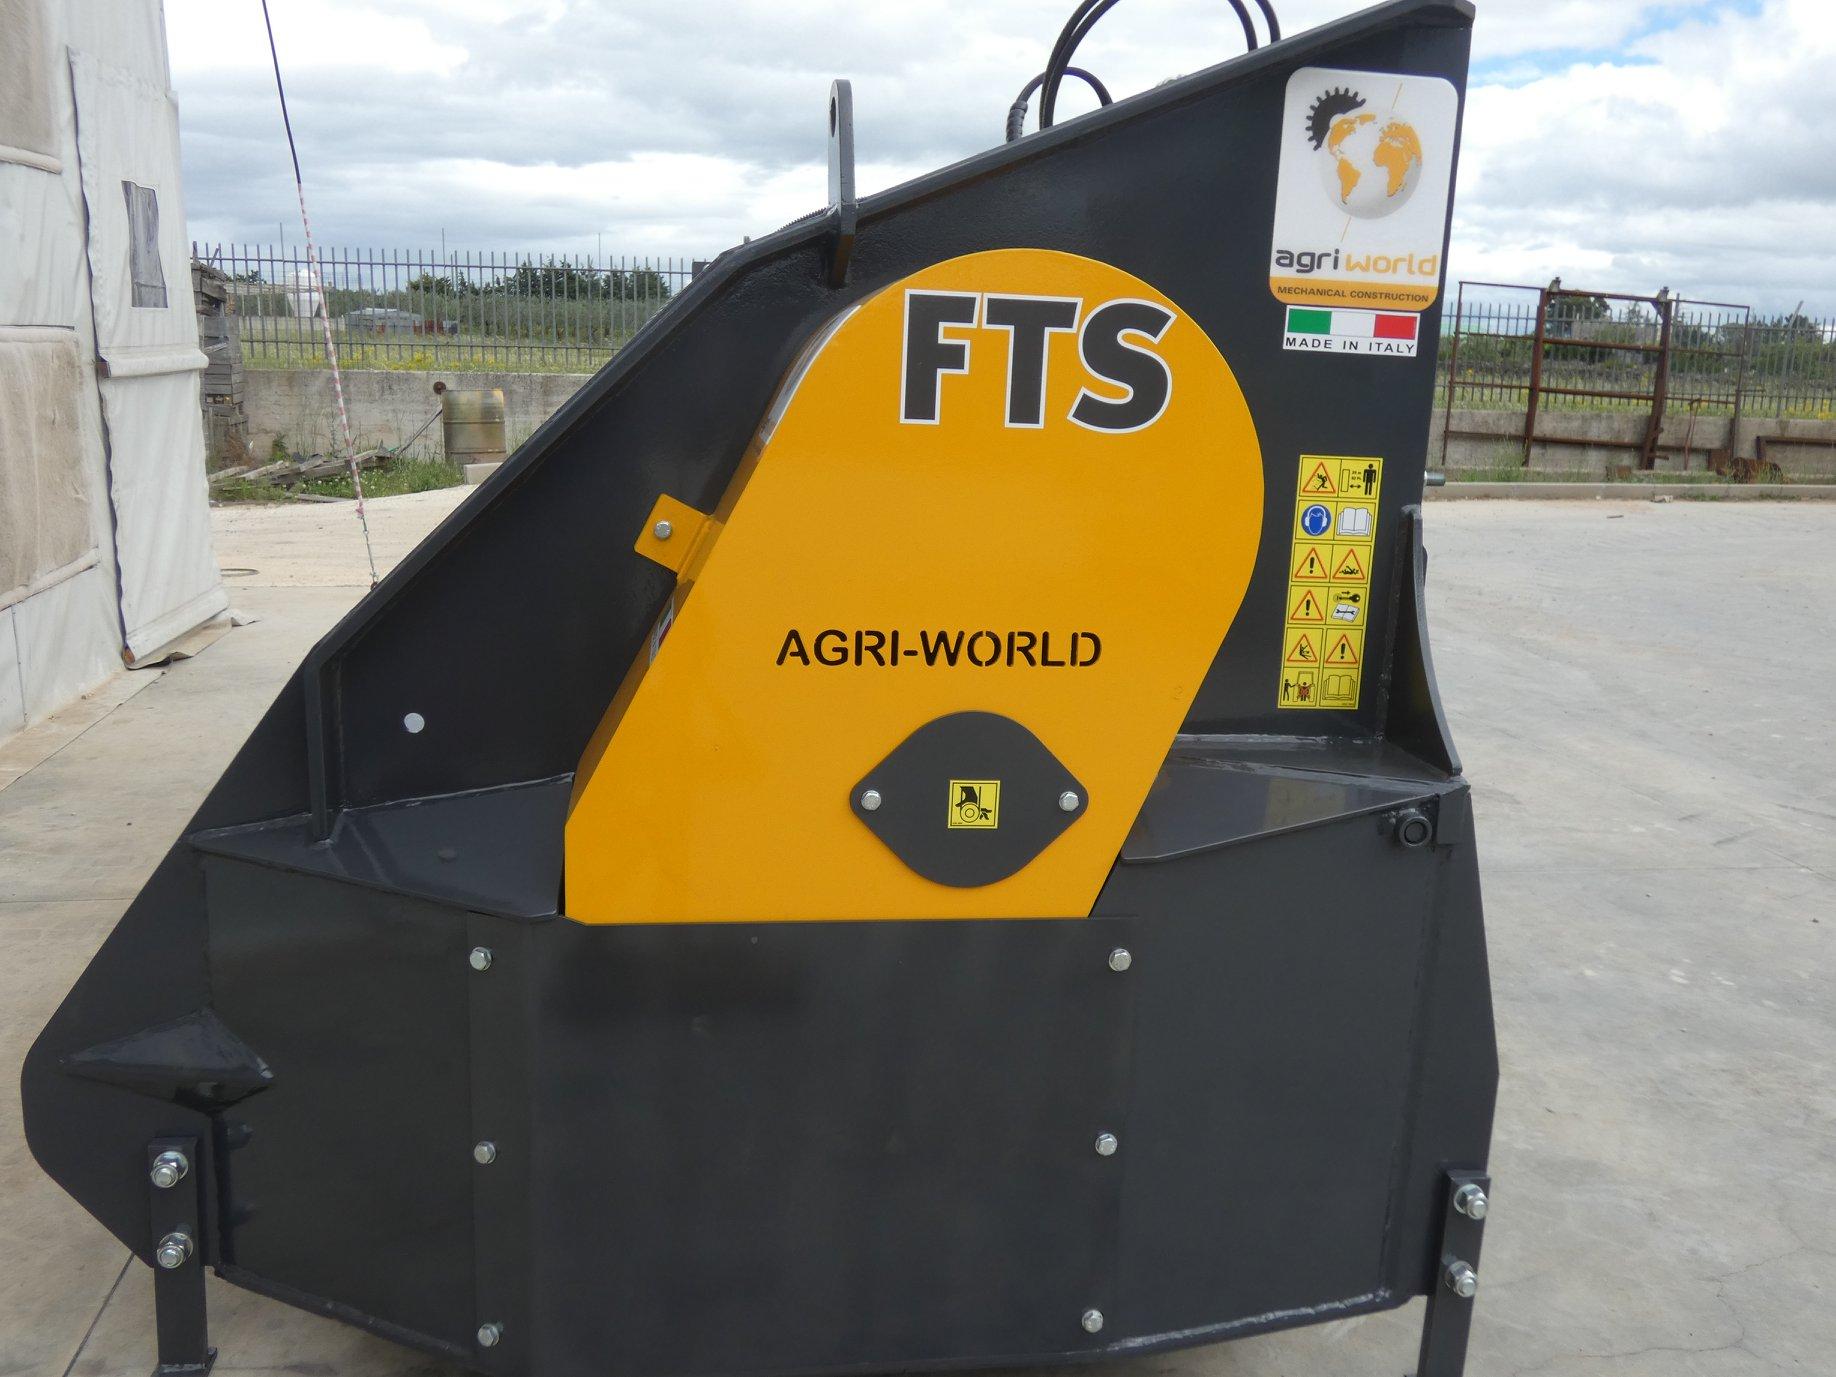 AgriWorld Trituradora de Piedras FTS 80.07 AgriWorld - 2